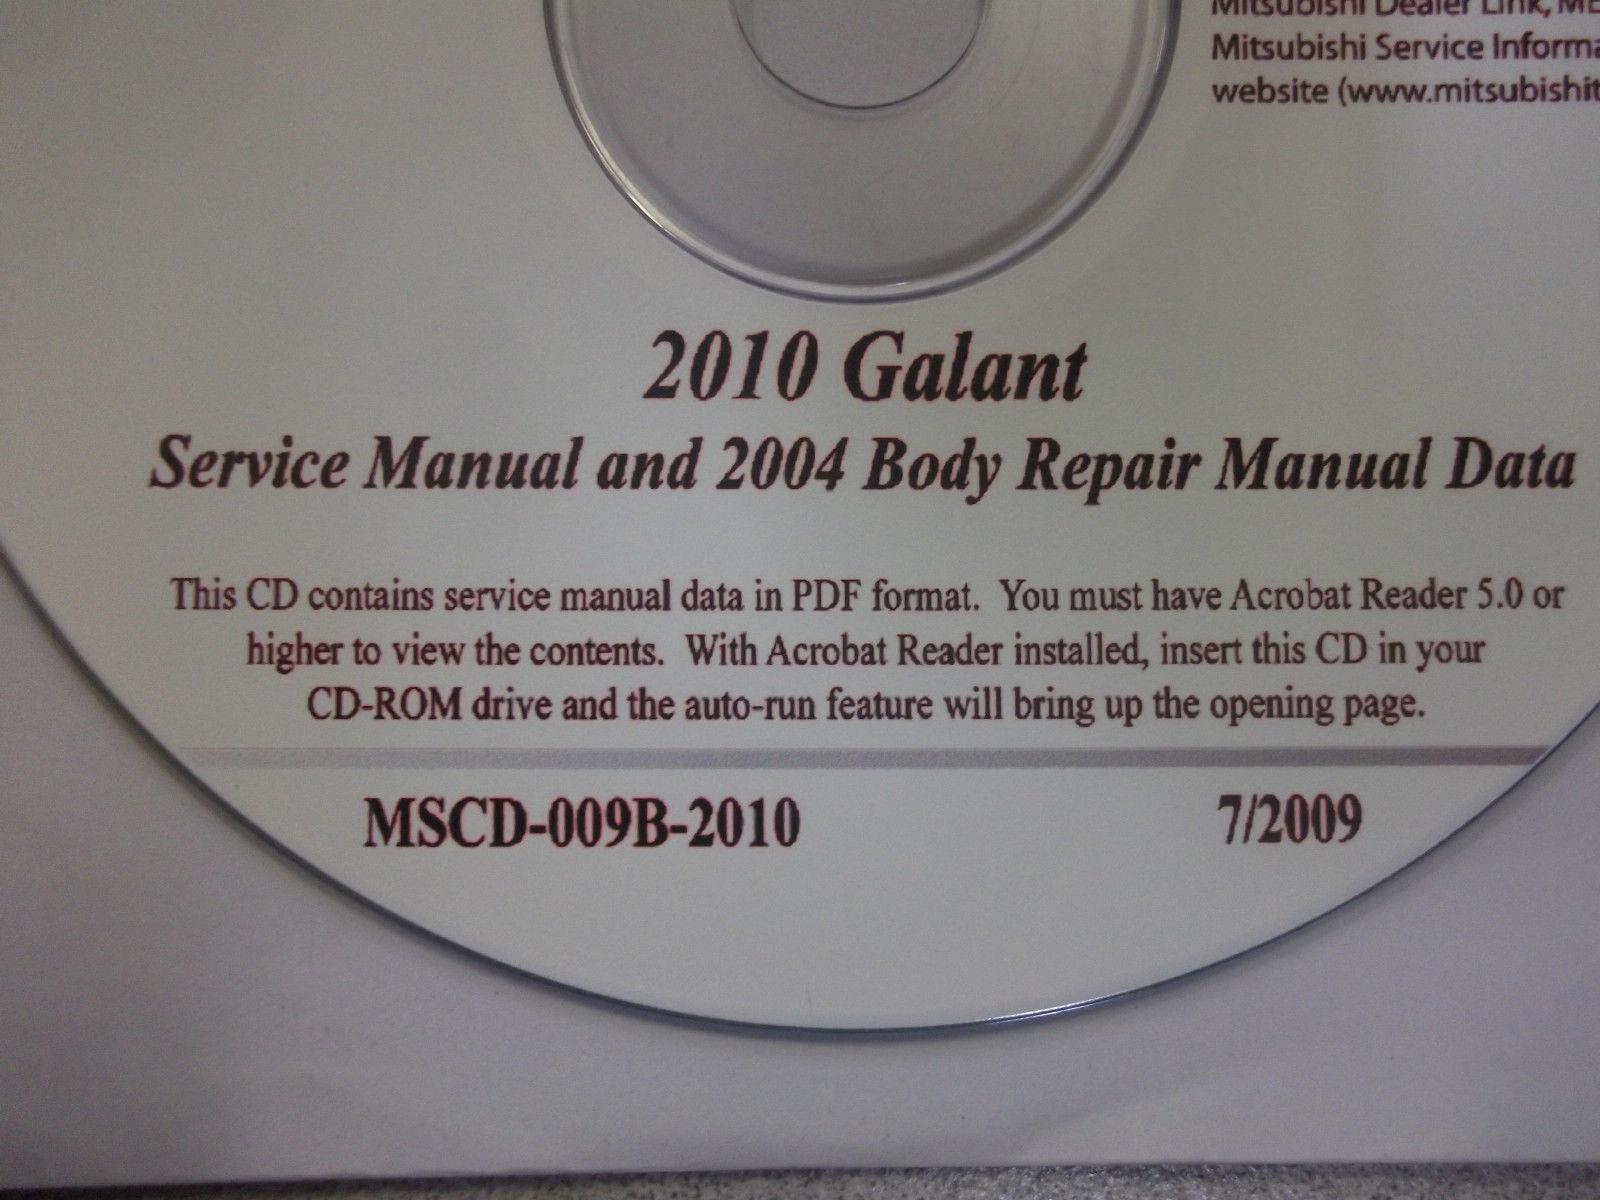 2010 2004 MITSUBISHI GALANT Service Shop Manual CD FACTORY OEM BARGAIN 10 04